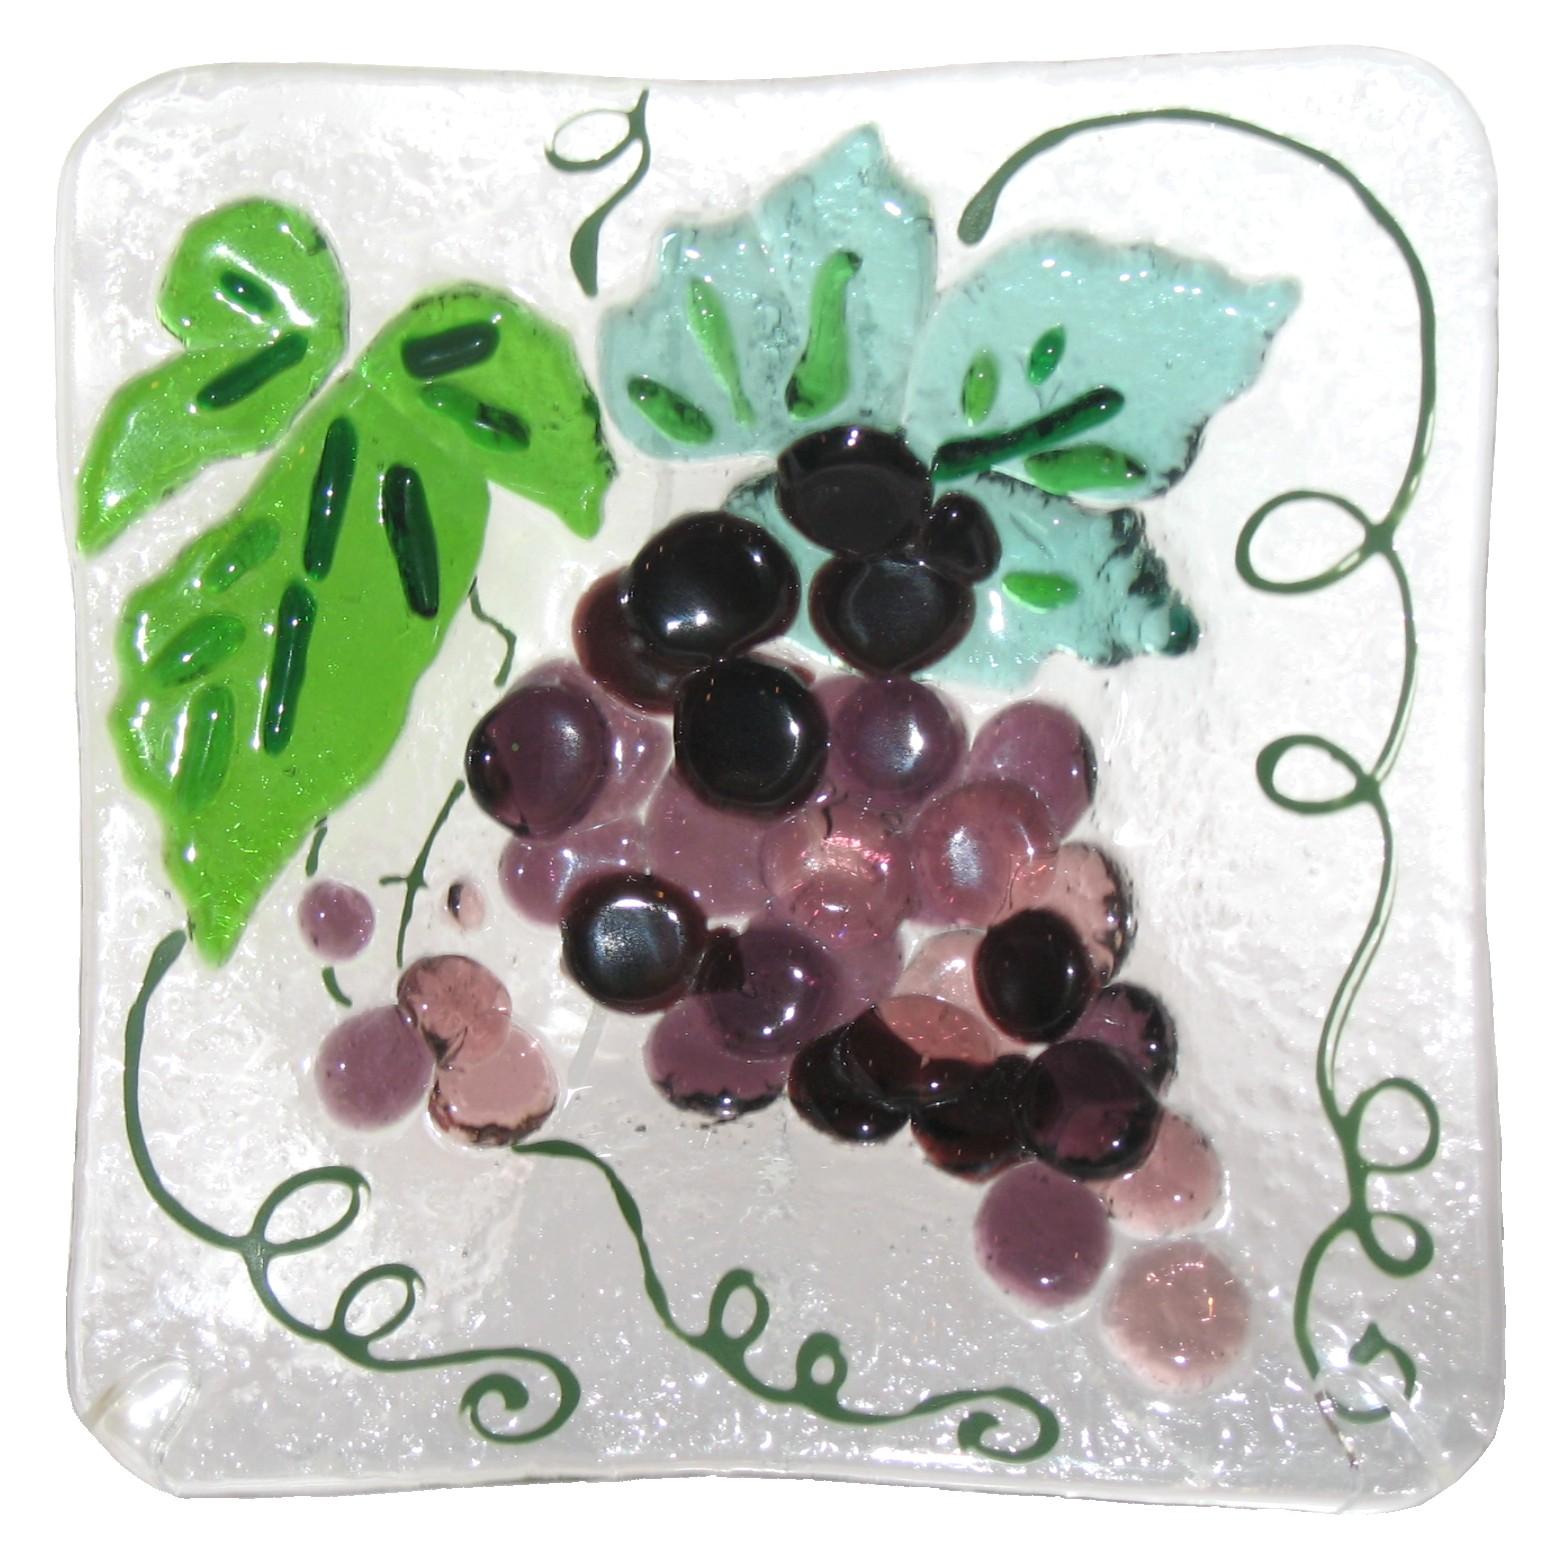 talerzyk Winogrona kolekcja Owoce fusing Basole